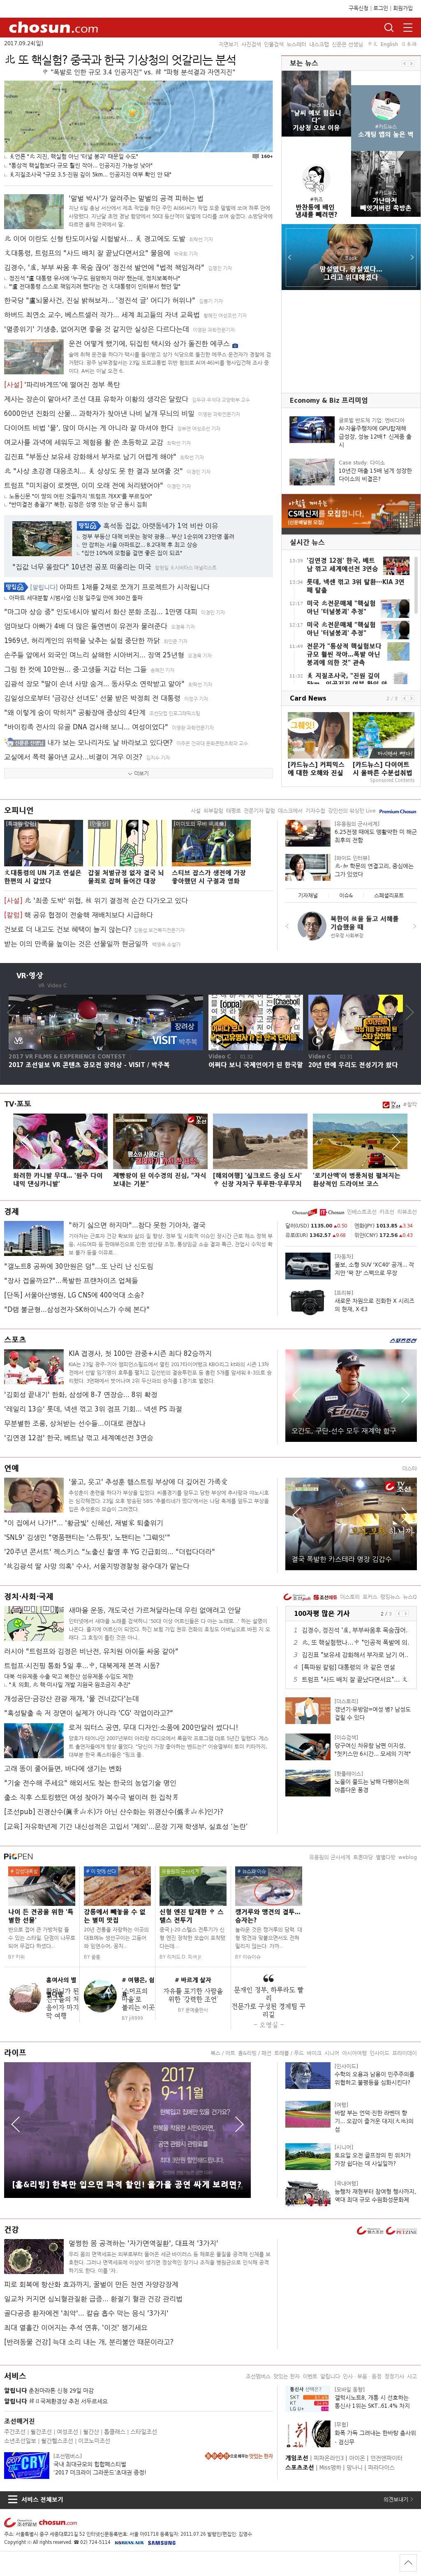 chosun.com at Saturday Sept. 23, 2017, 5:29 p.m. UTC